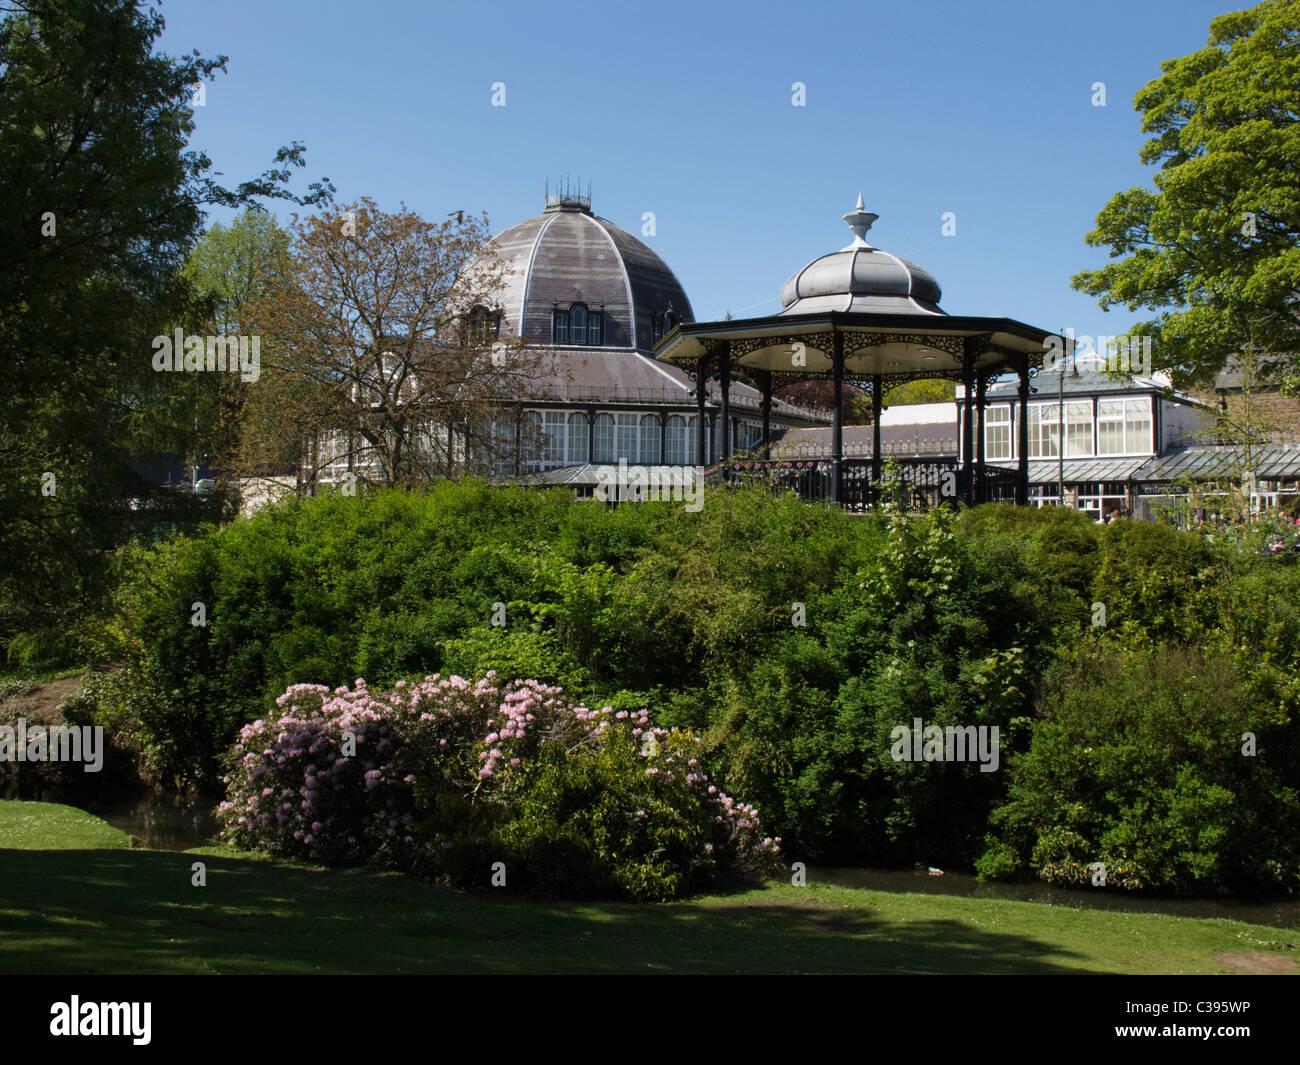 Buxton pavilion and bandstand  Derbyshire Peak District England - Stock Image